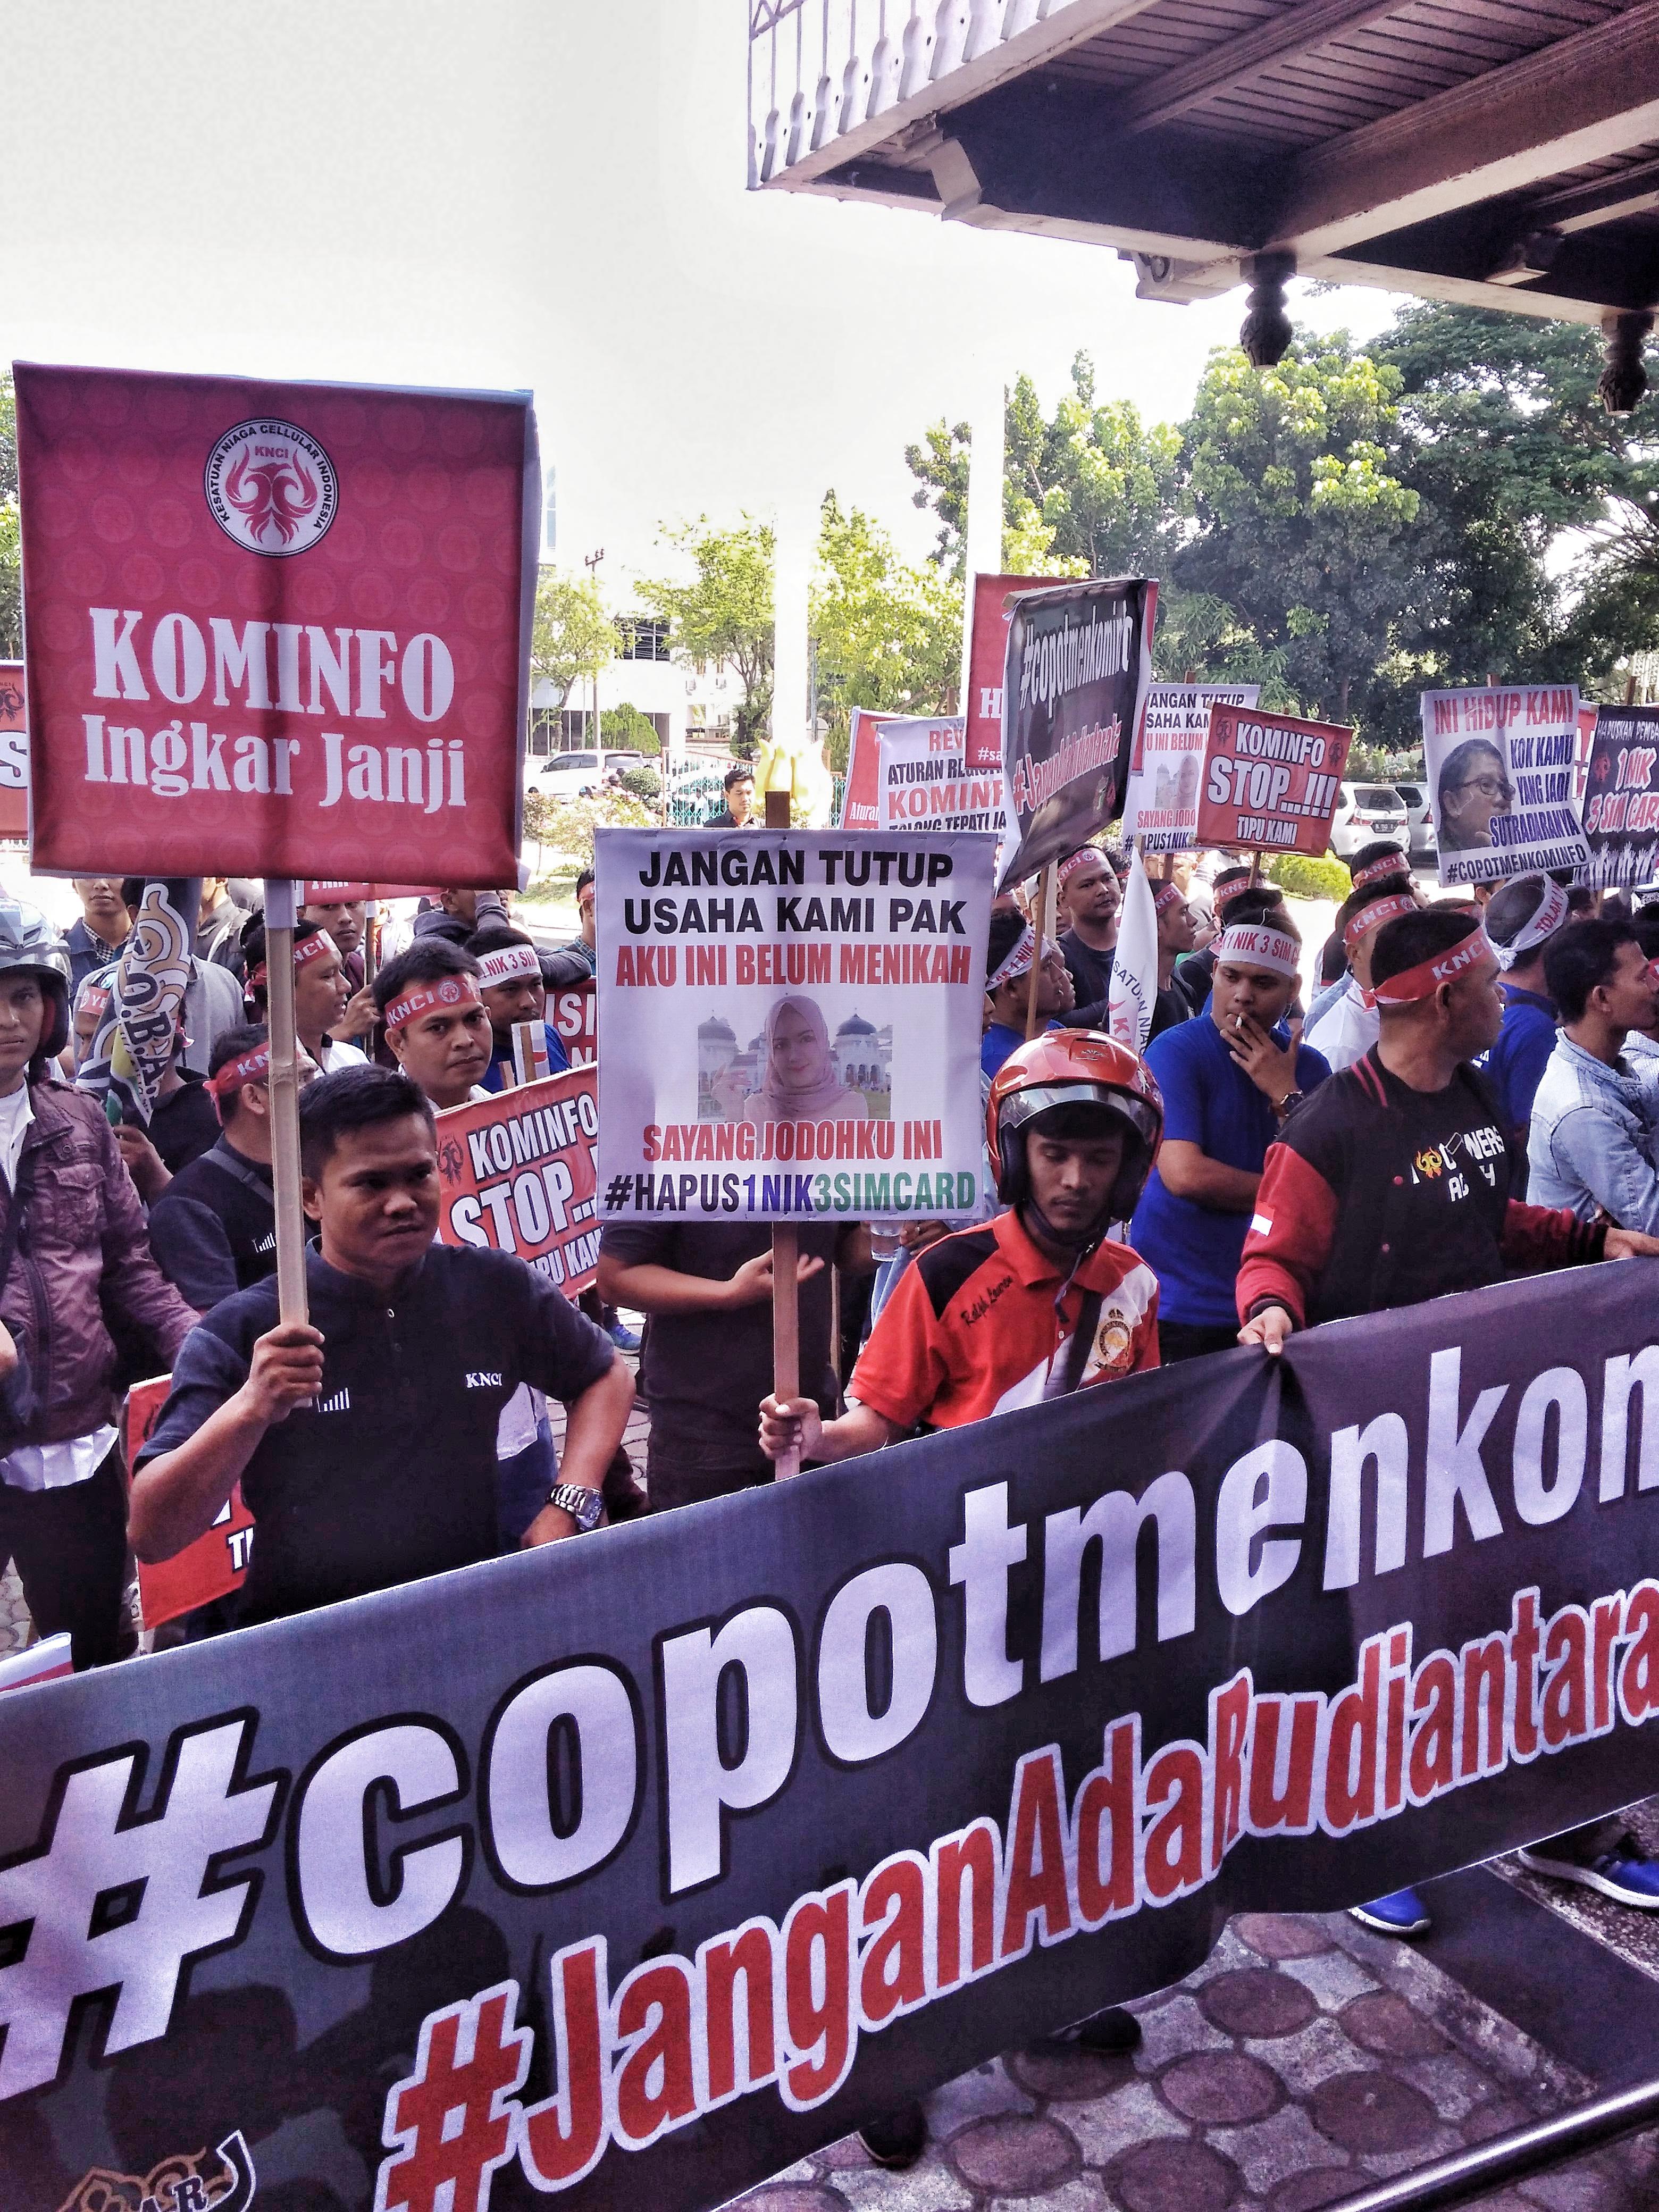 Terancam Gulung Tikar, Outlet Pulsa Demo Di Kantor DPRA